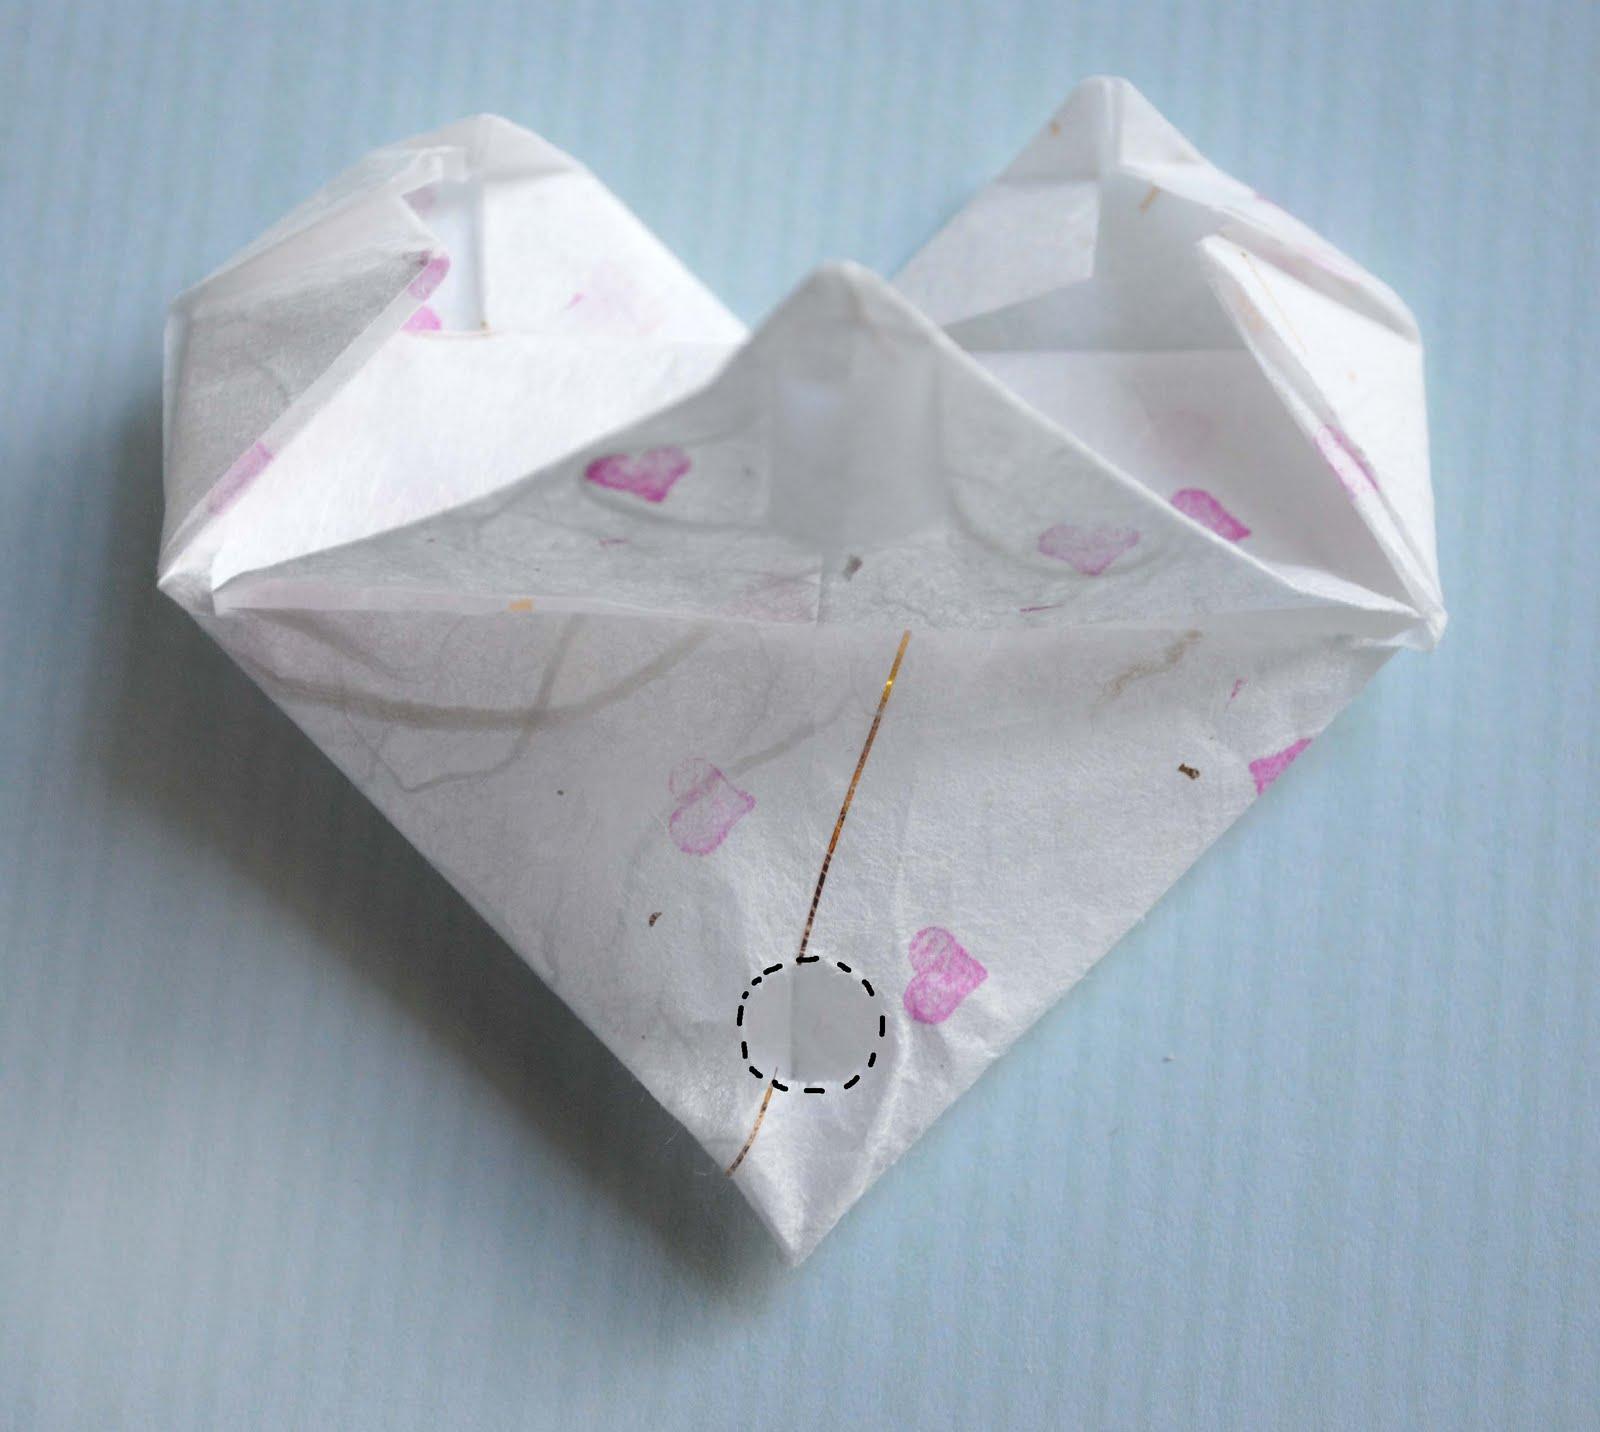 zakka life: Craft: Origami Heart Valentines - photo#20